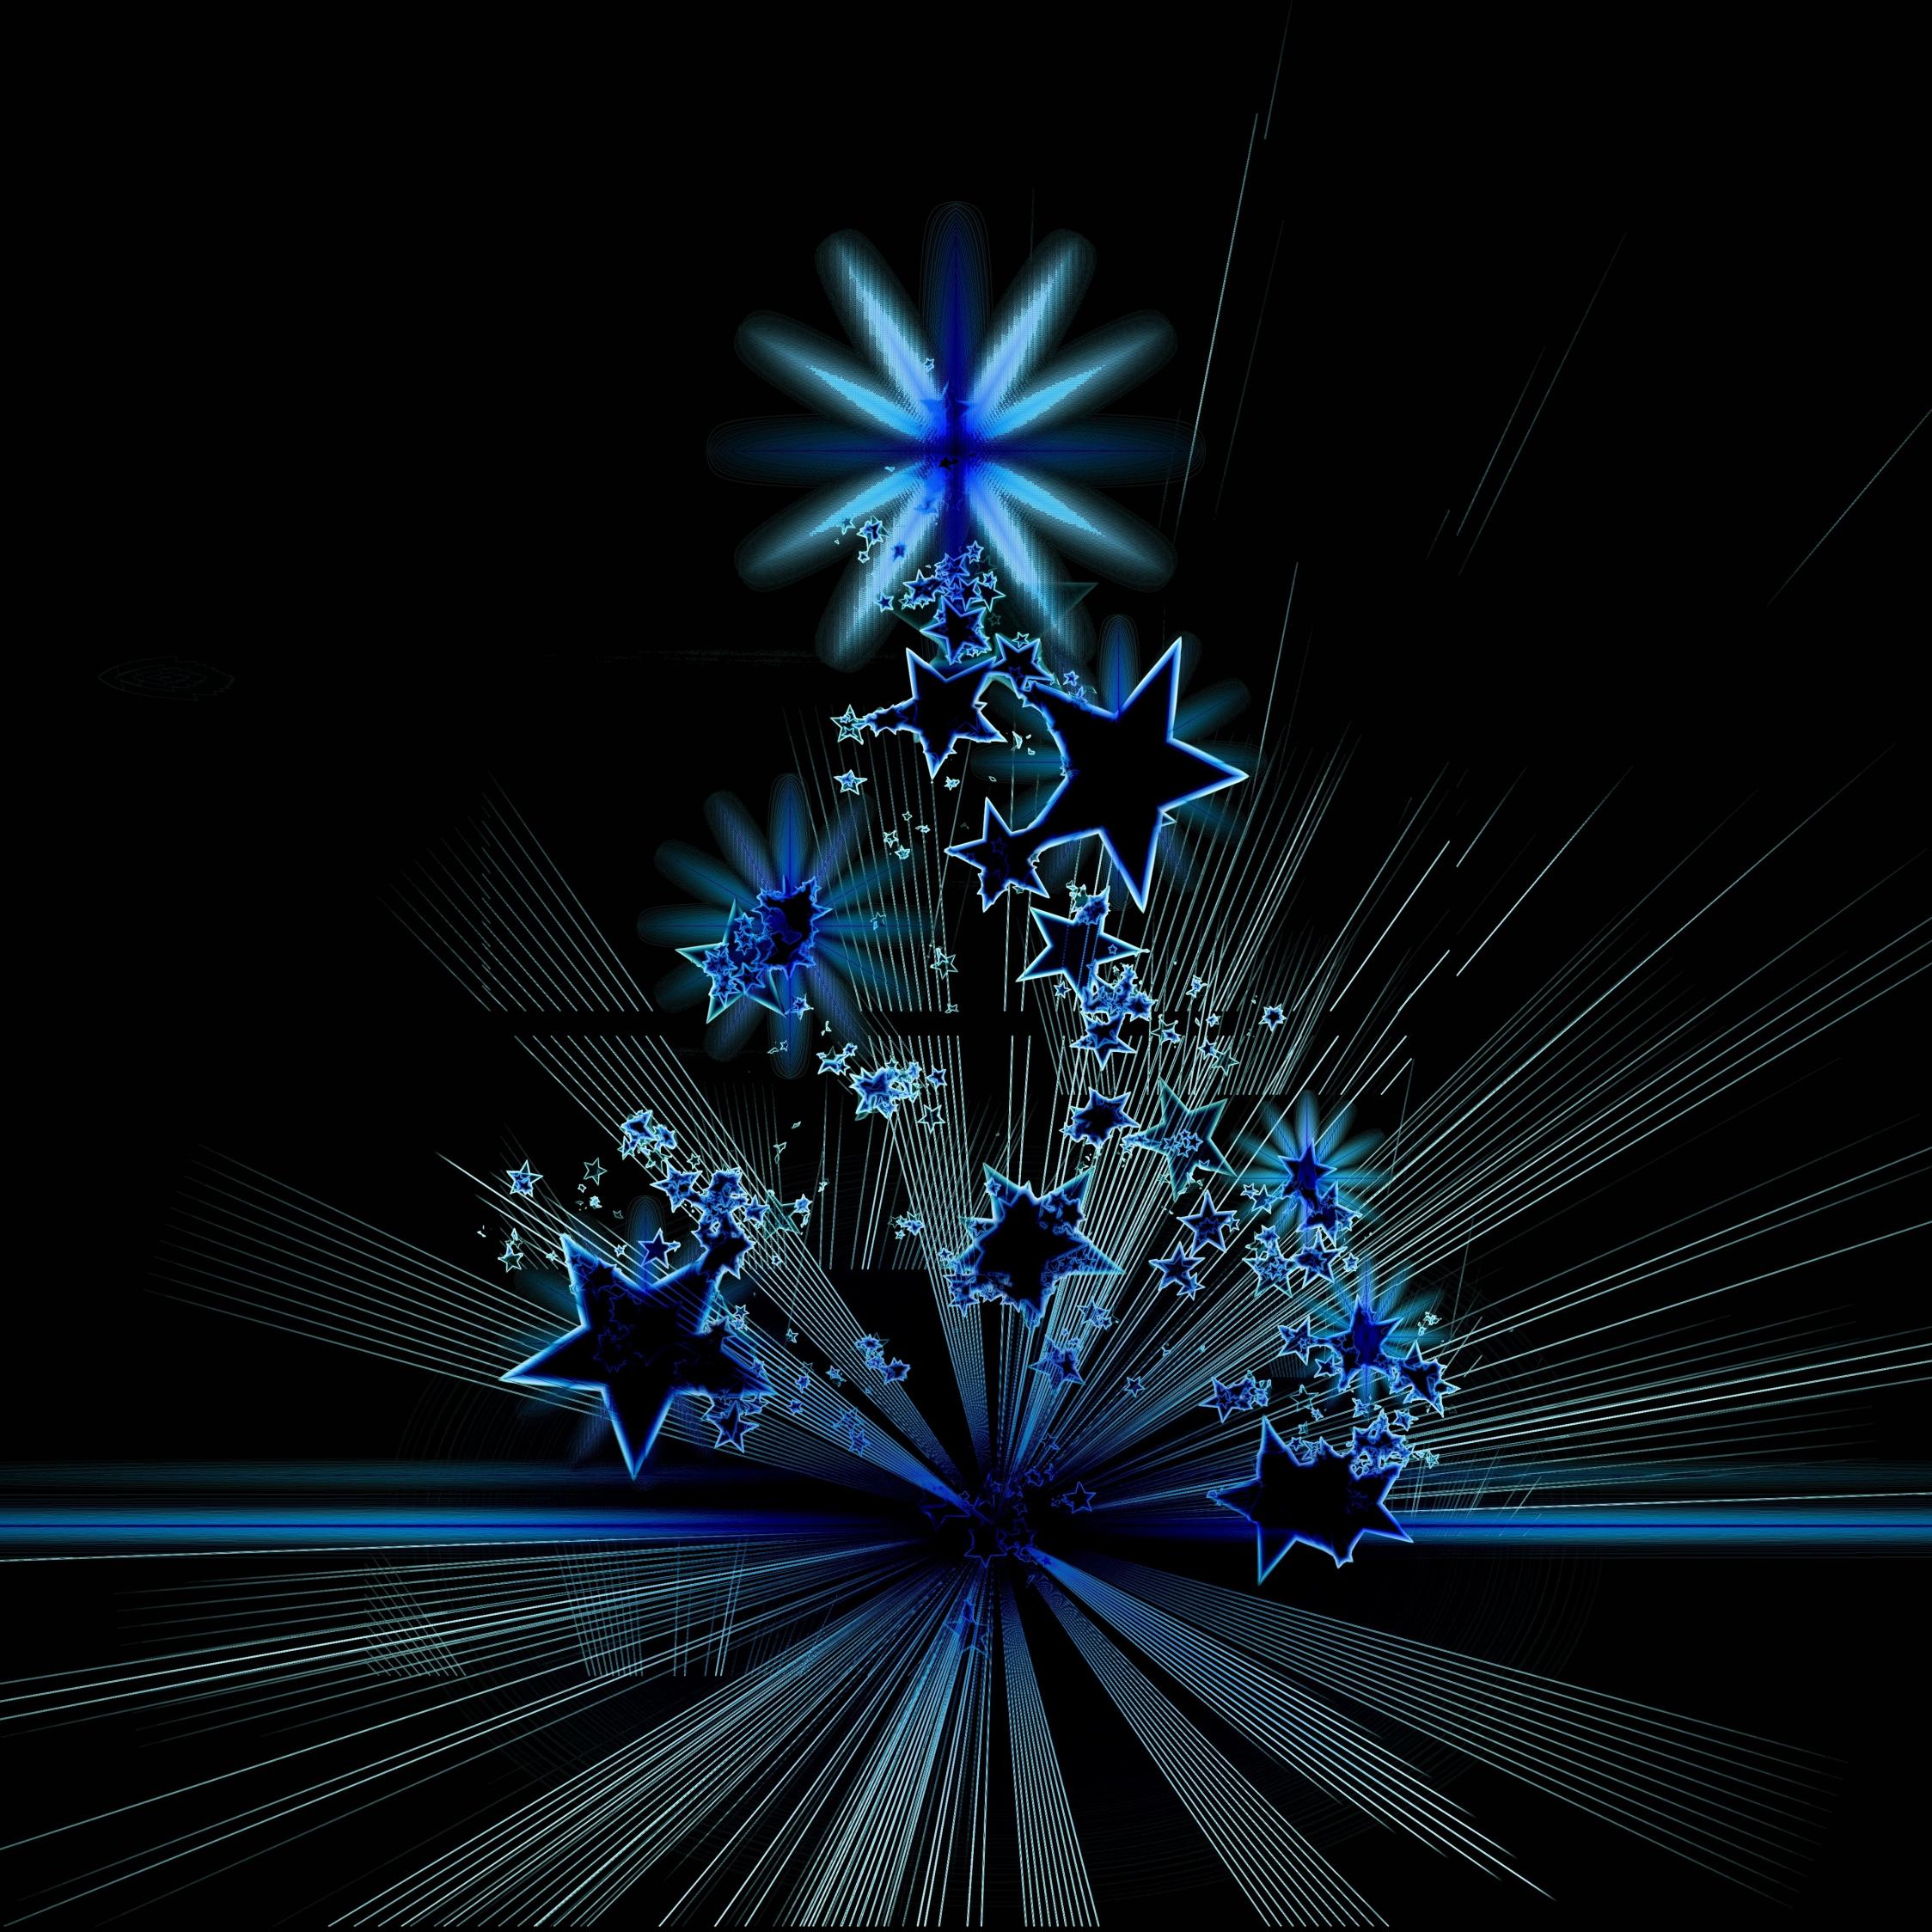 Christmas Tree Stars Abstract Digital Art 2248x2248 Wallpaper